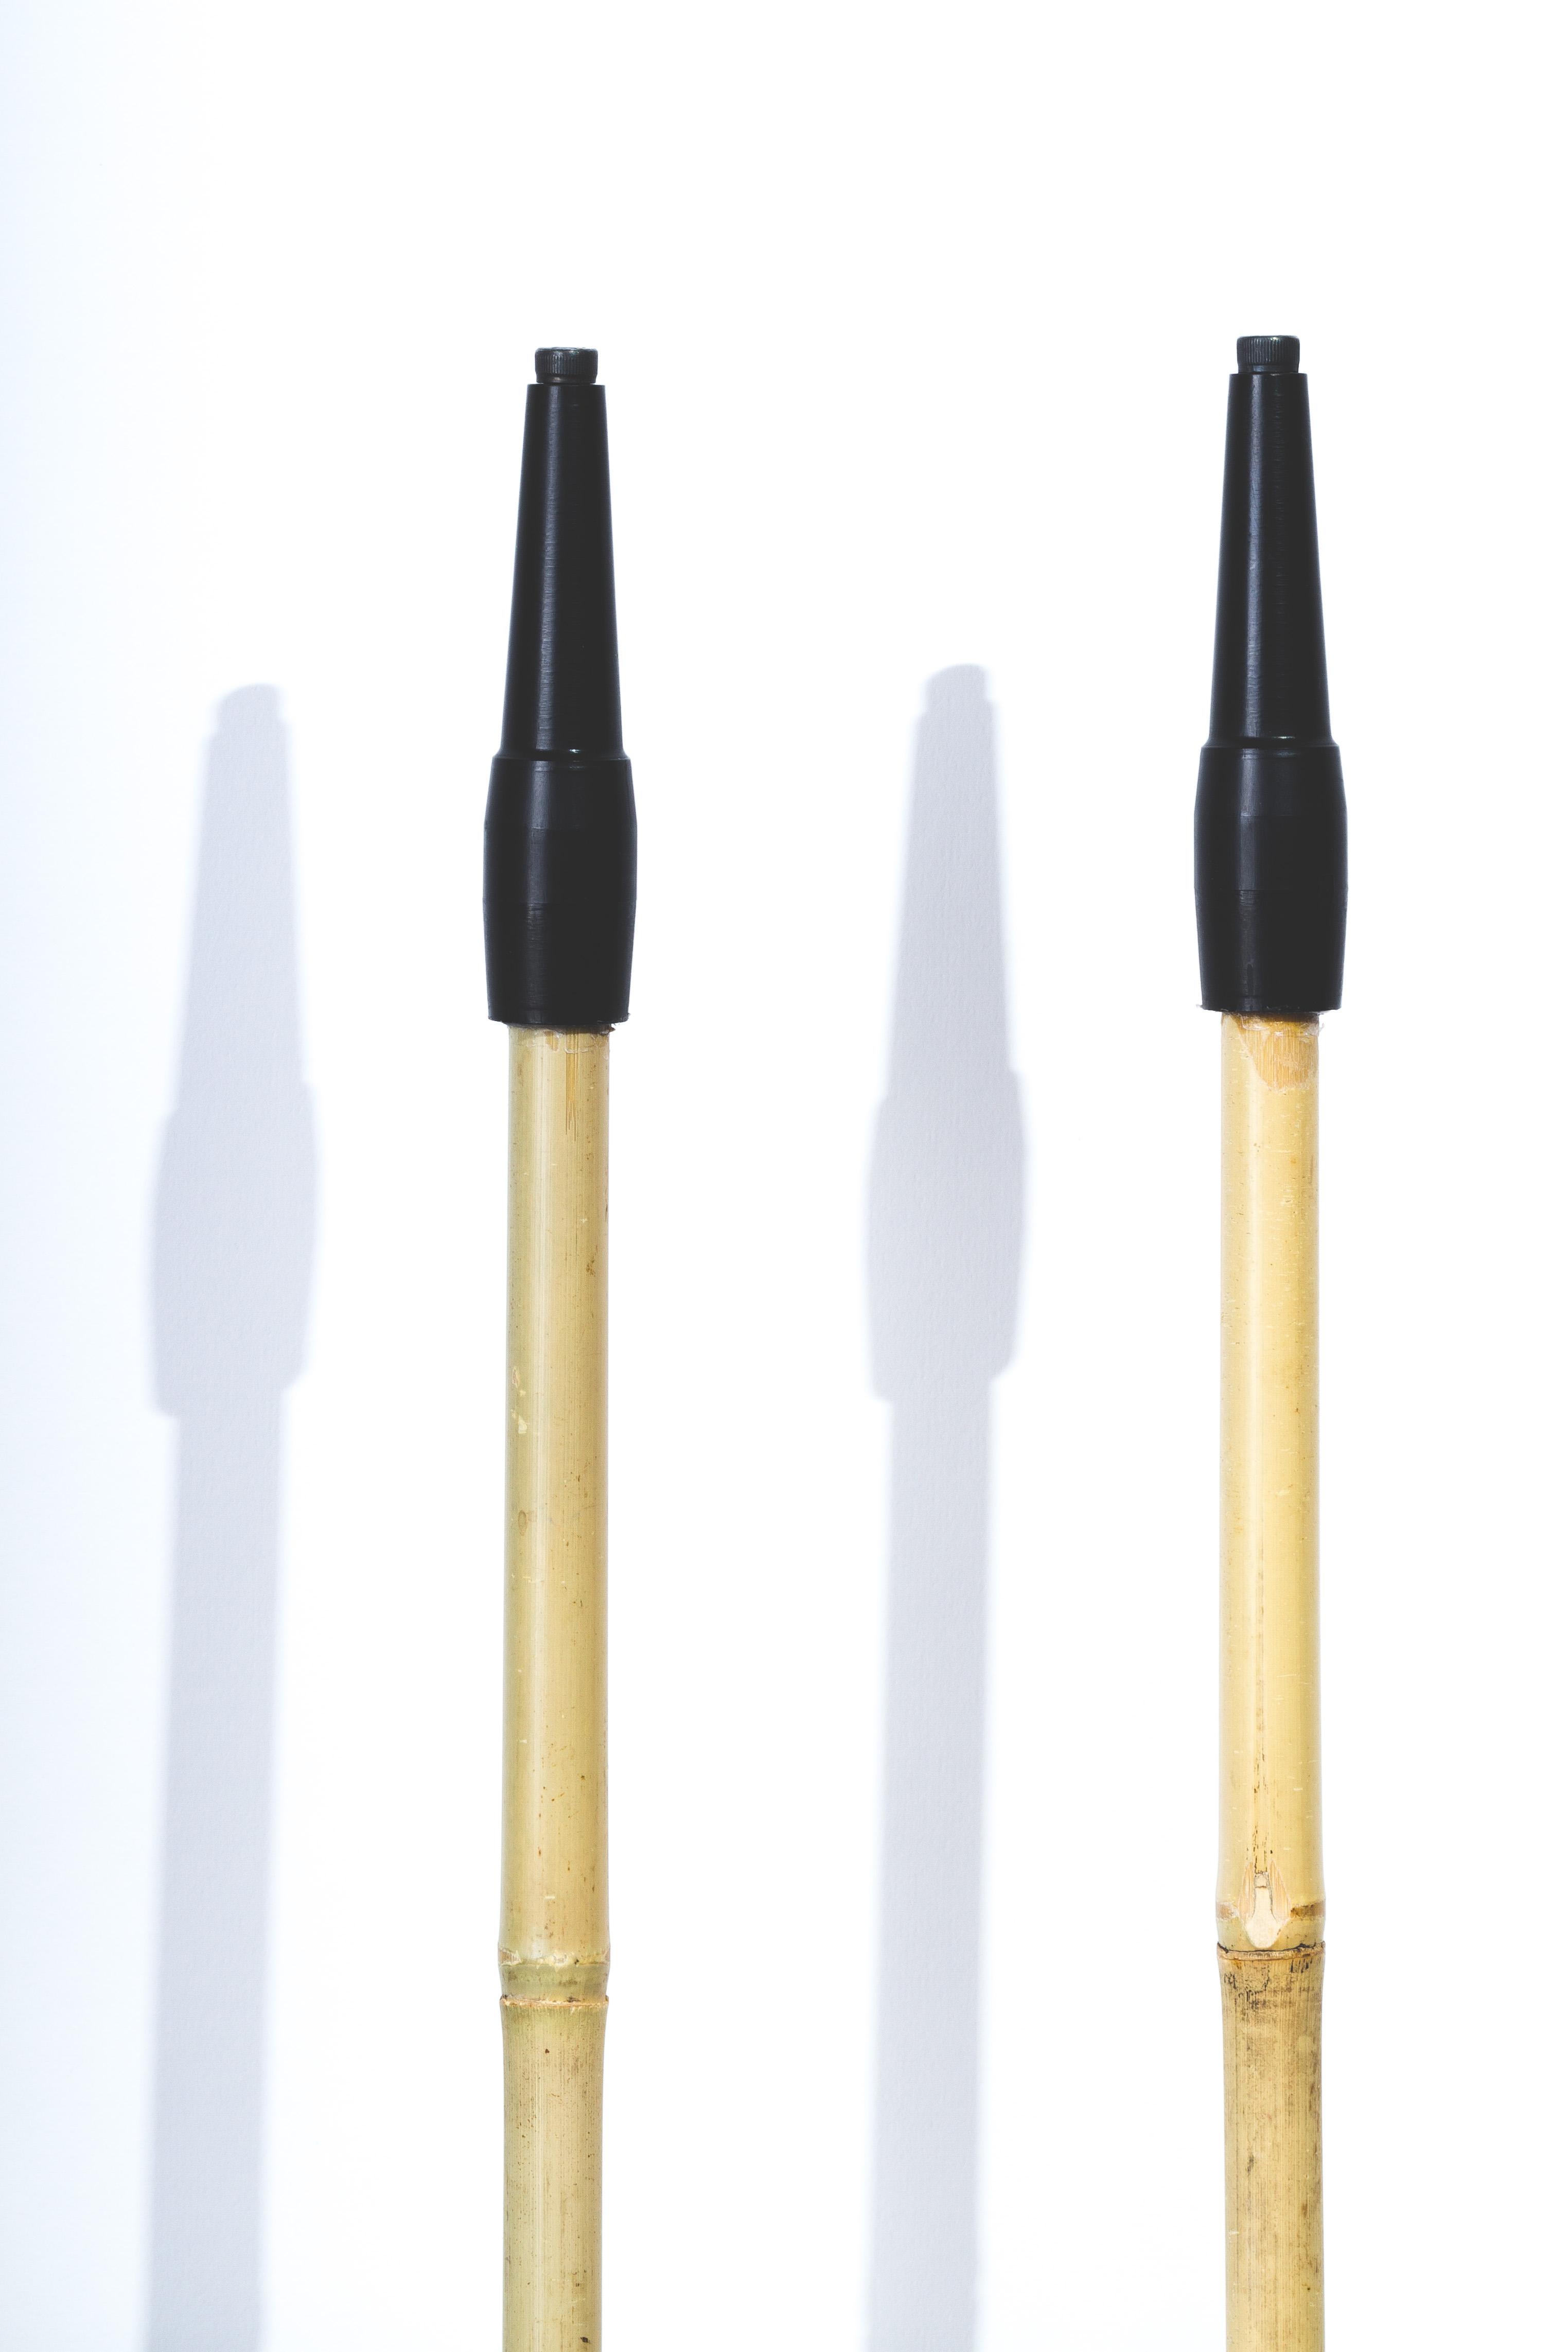 Uphill Designs - Alpine bamboo and cork trekking poles - tips